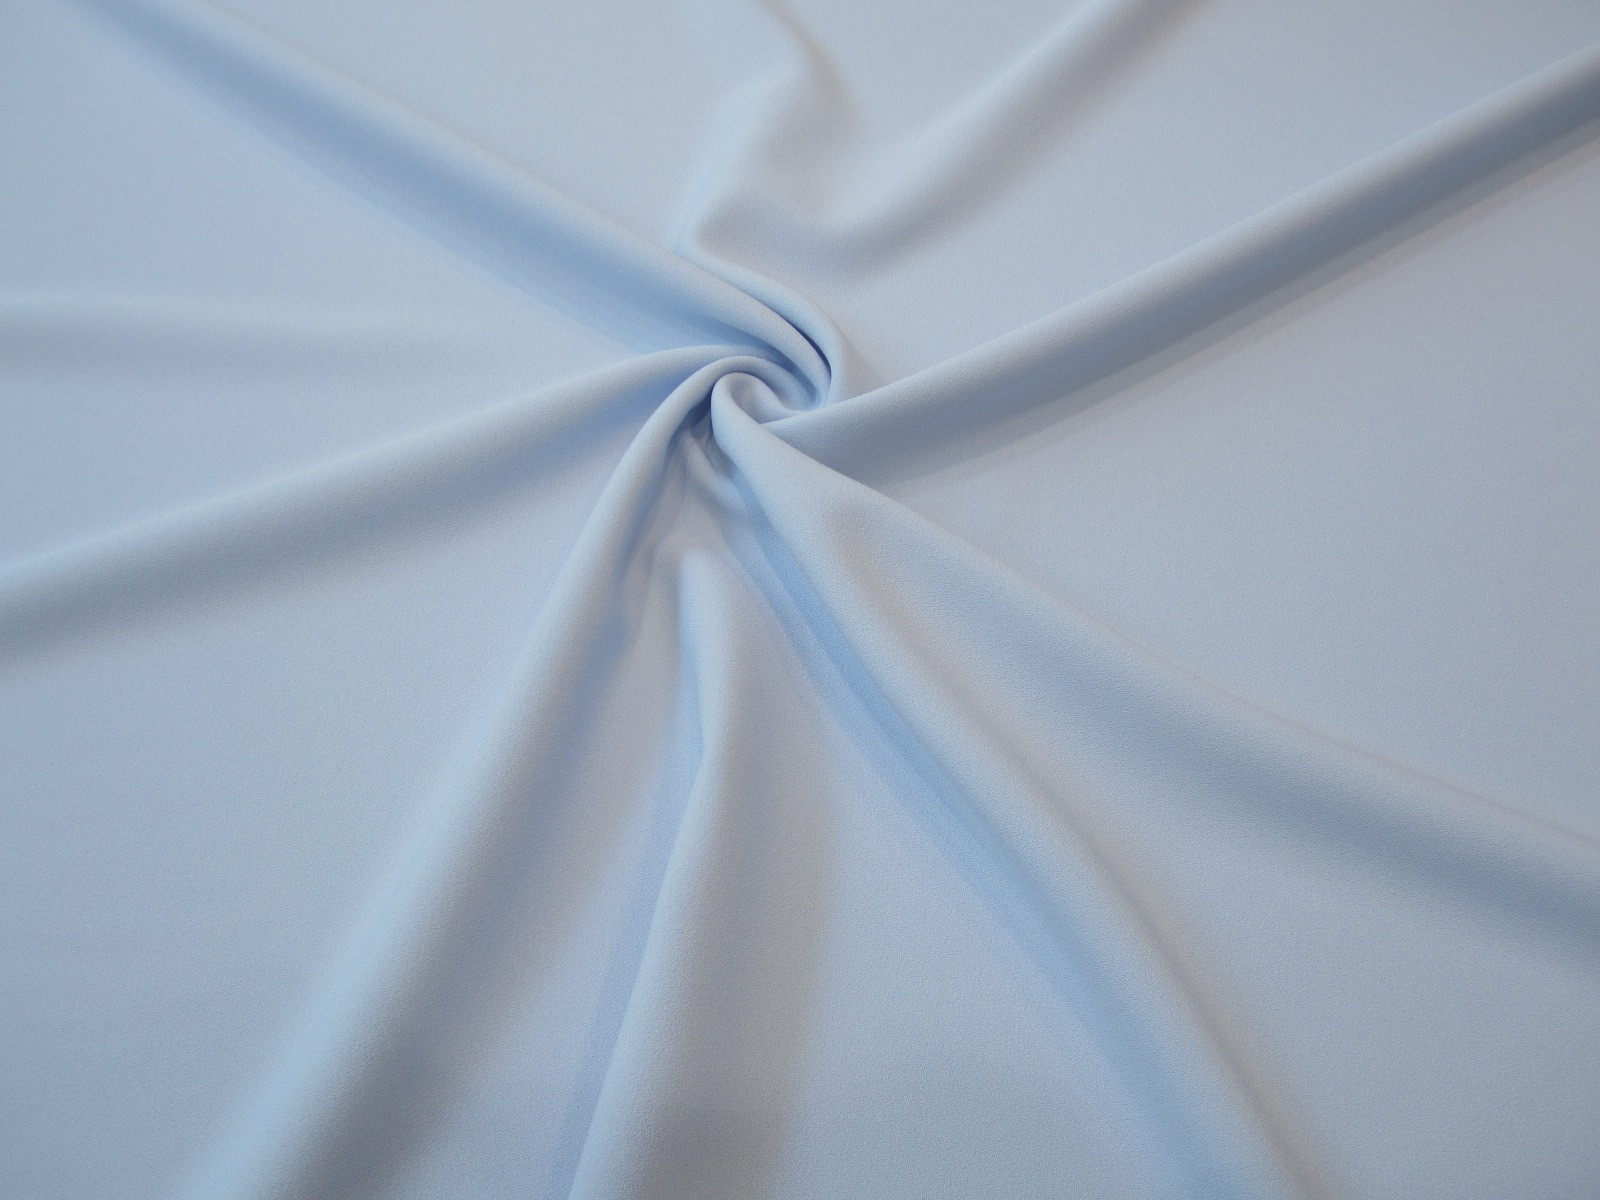 Krepa z elastanem Rosario błękit królewski jasny